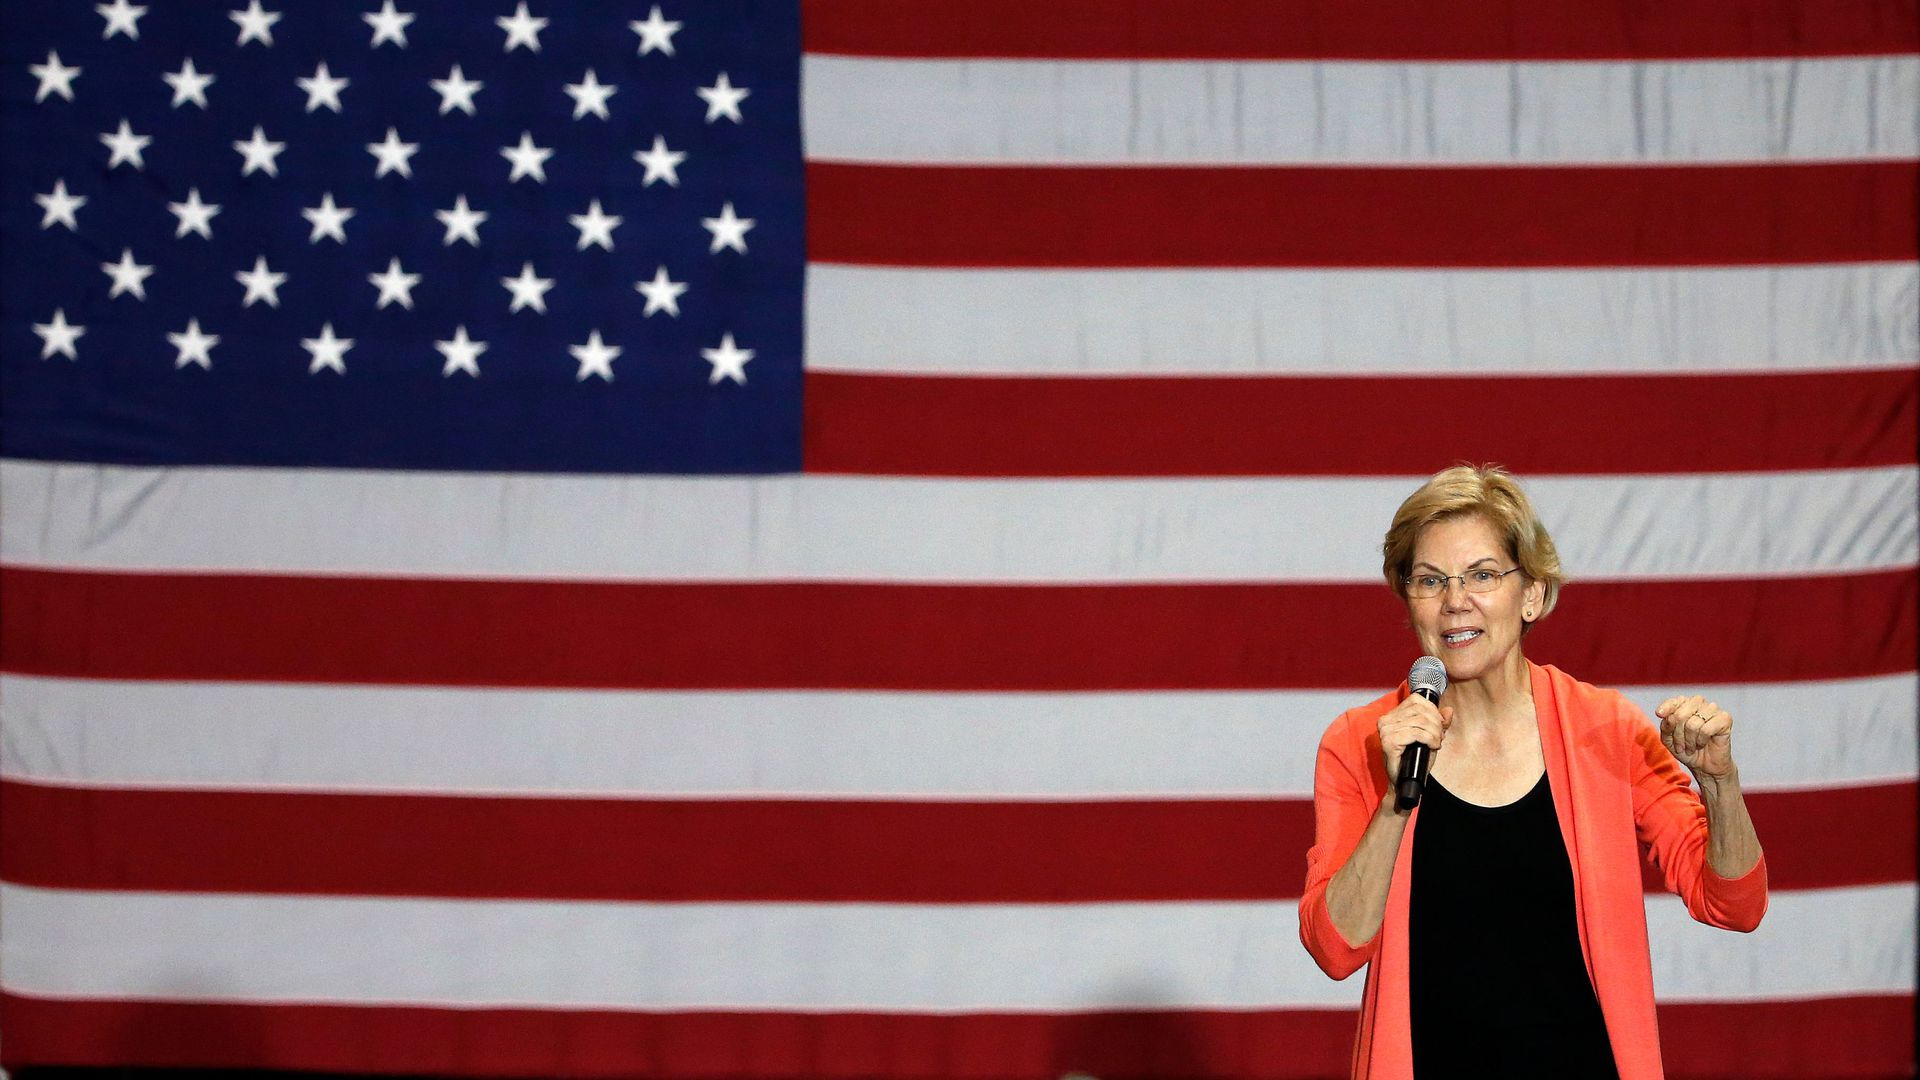 """The best leader for these times"": Elizabeth Warren endorsed by the Des Moines Register"